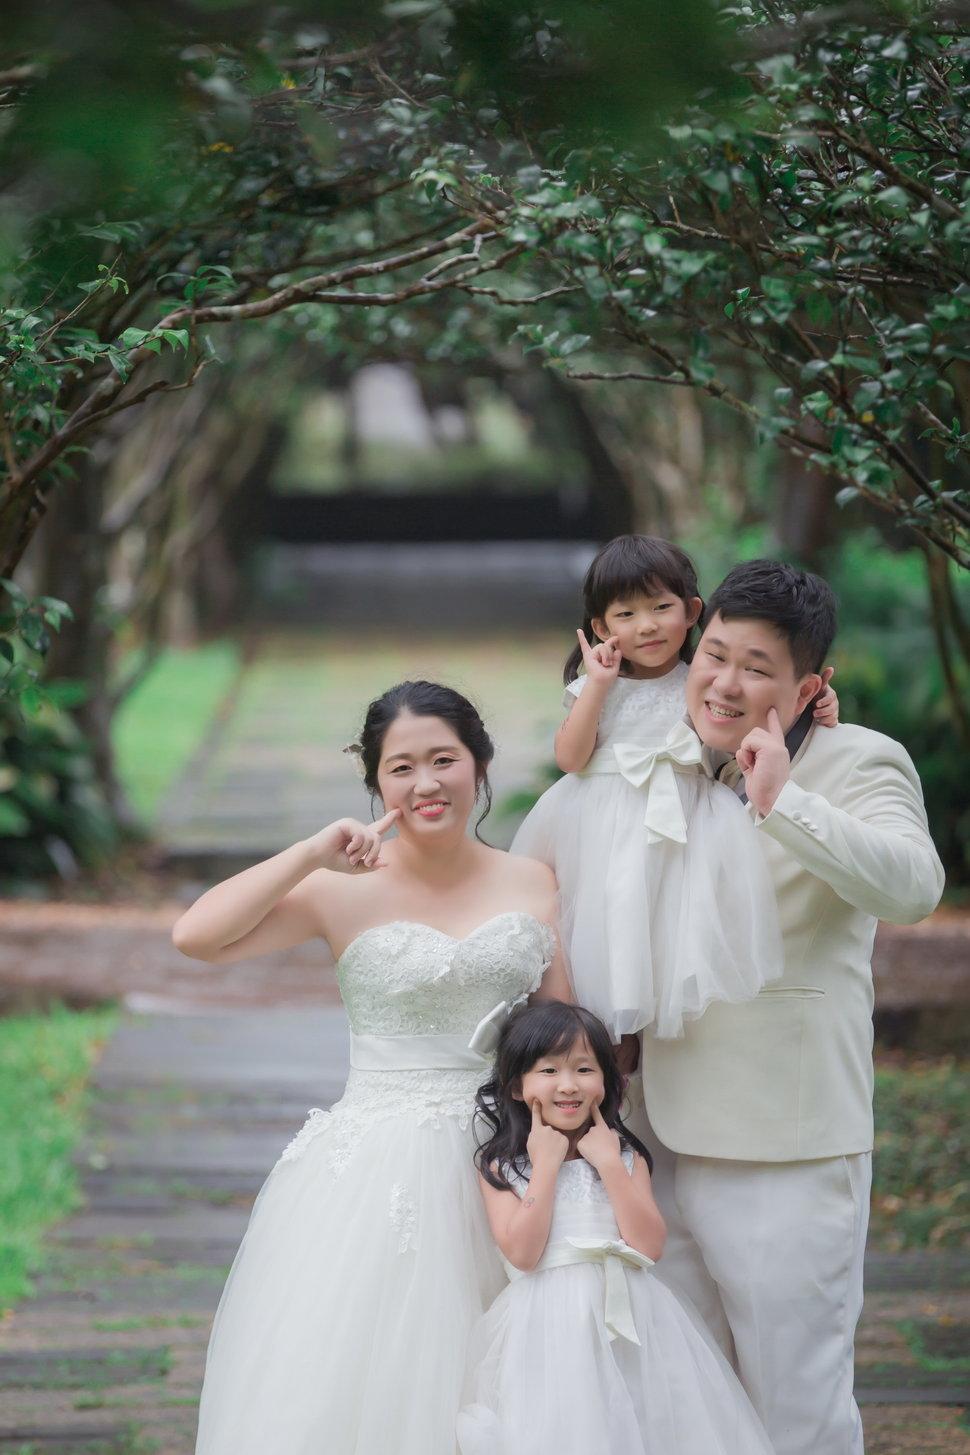 PP_0109_調整大小 - 巴黎婚紗攝影台灣總店《結婚吧》